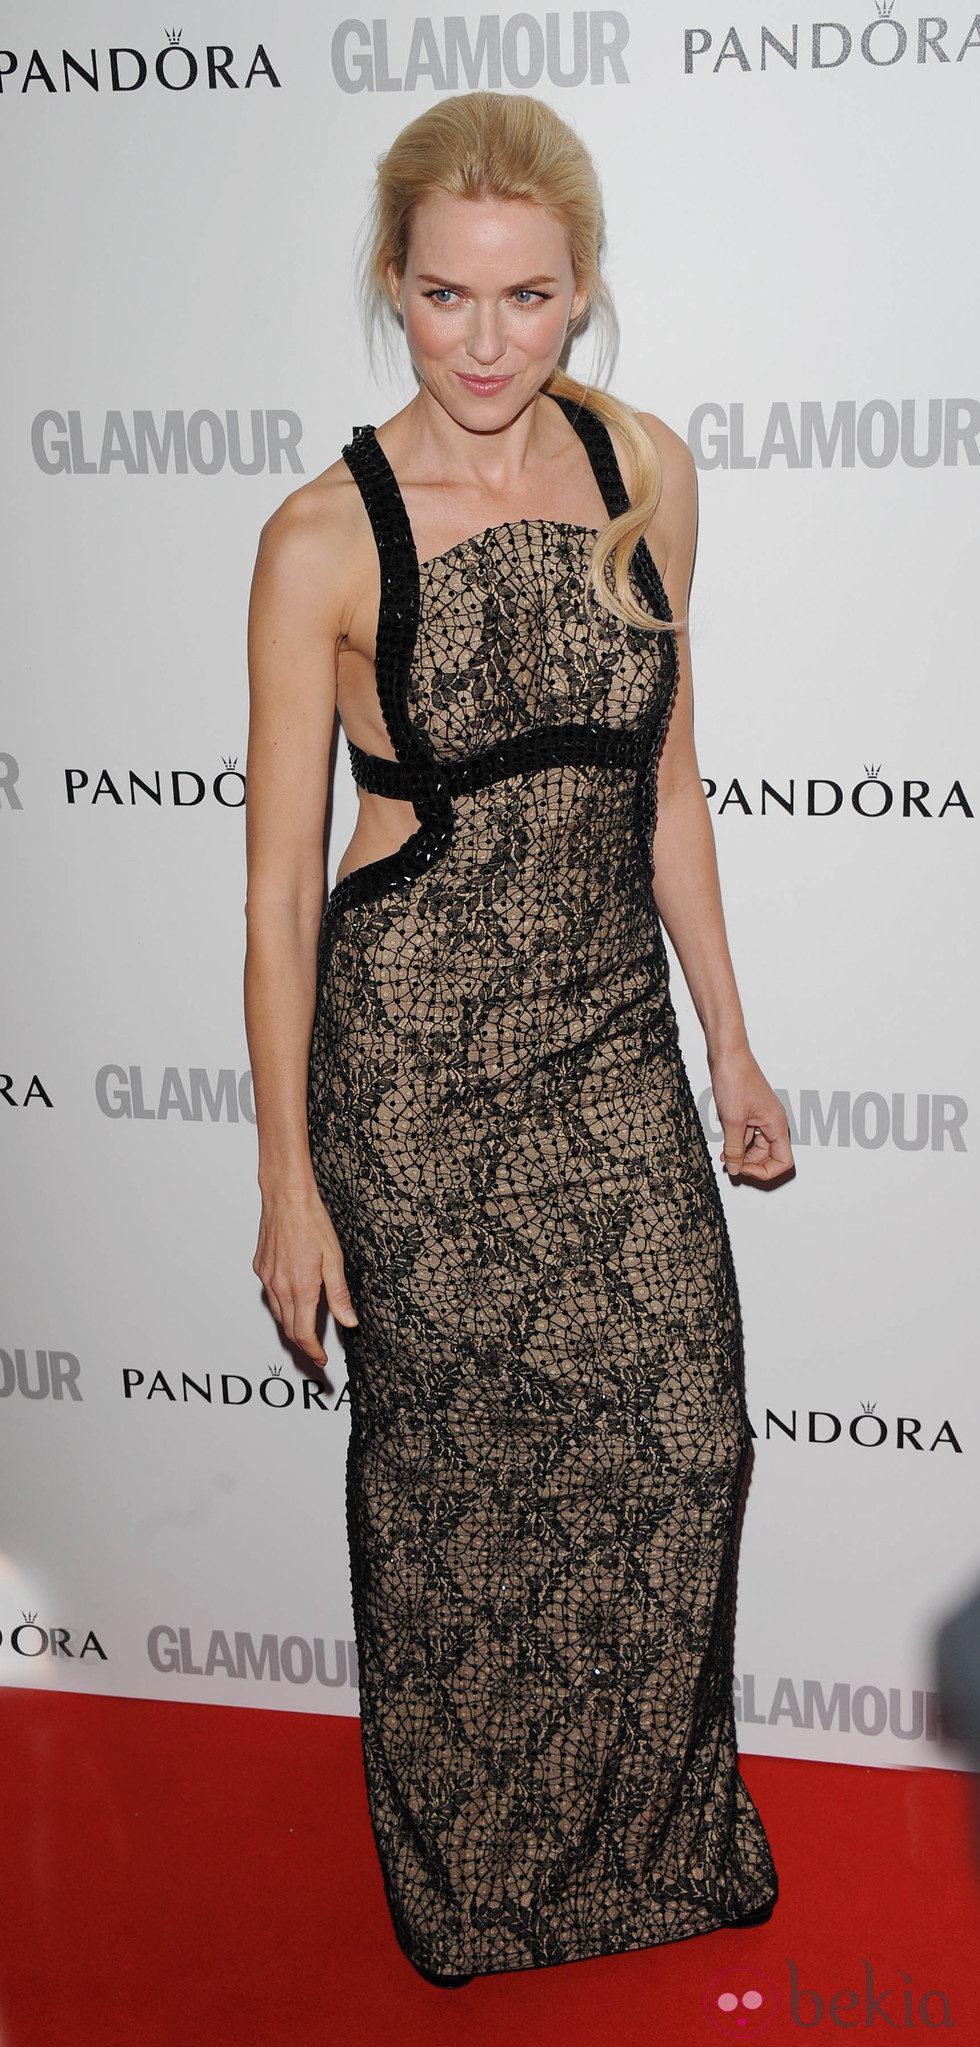 Naomi Watts en los Glamour Women of the Year Awards 2012 de Londres